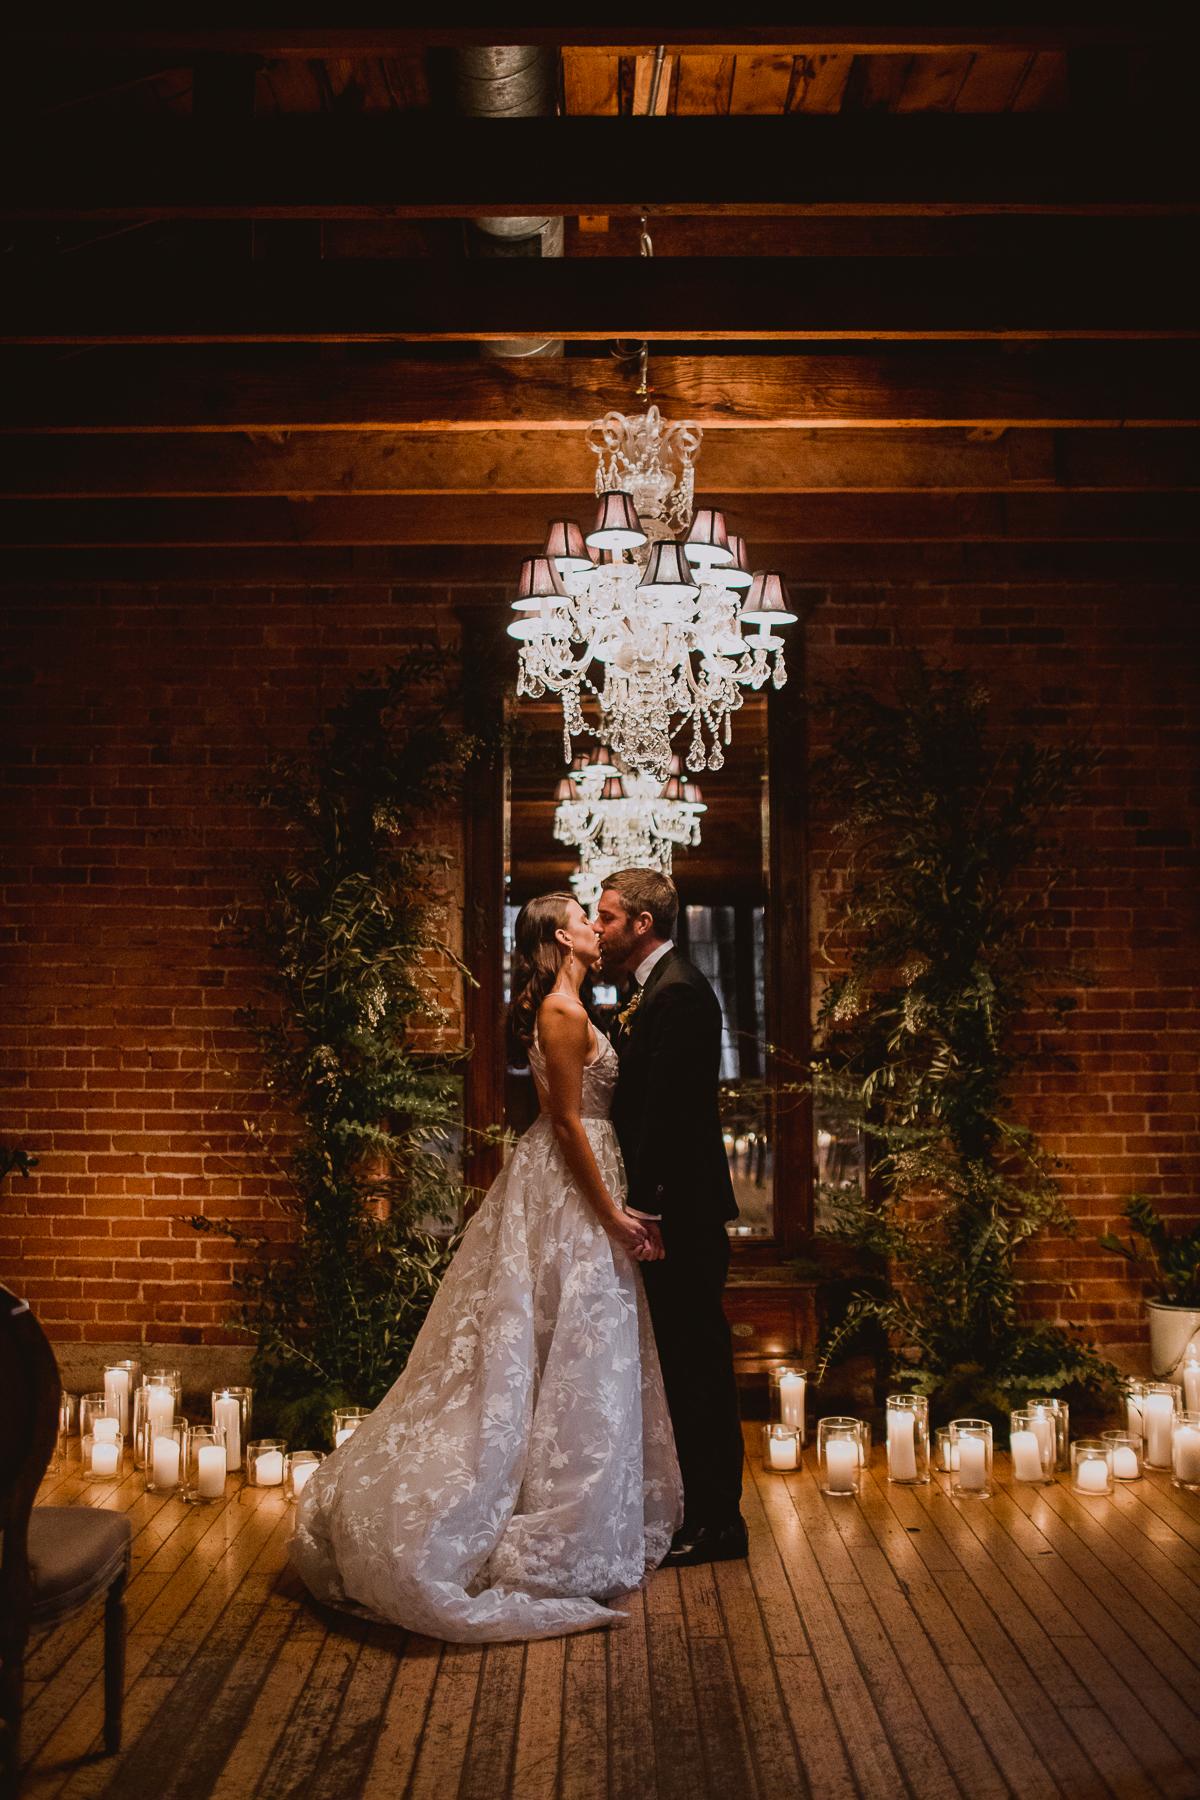 carondelet-house-kelley-raye-los-angeles-wedding-photographer-68.jpg